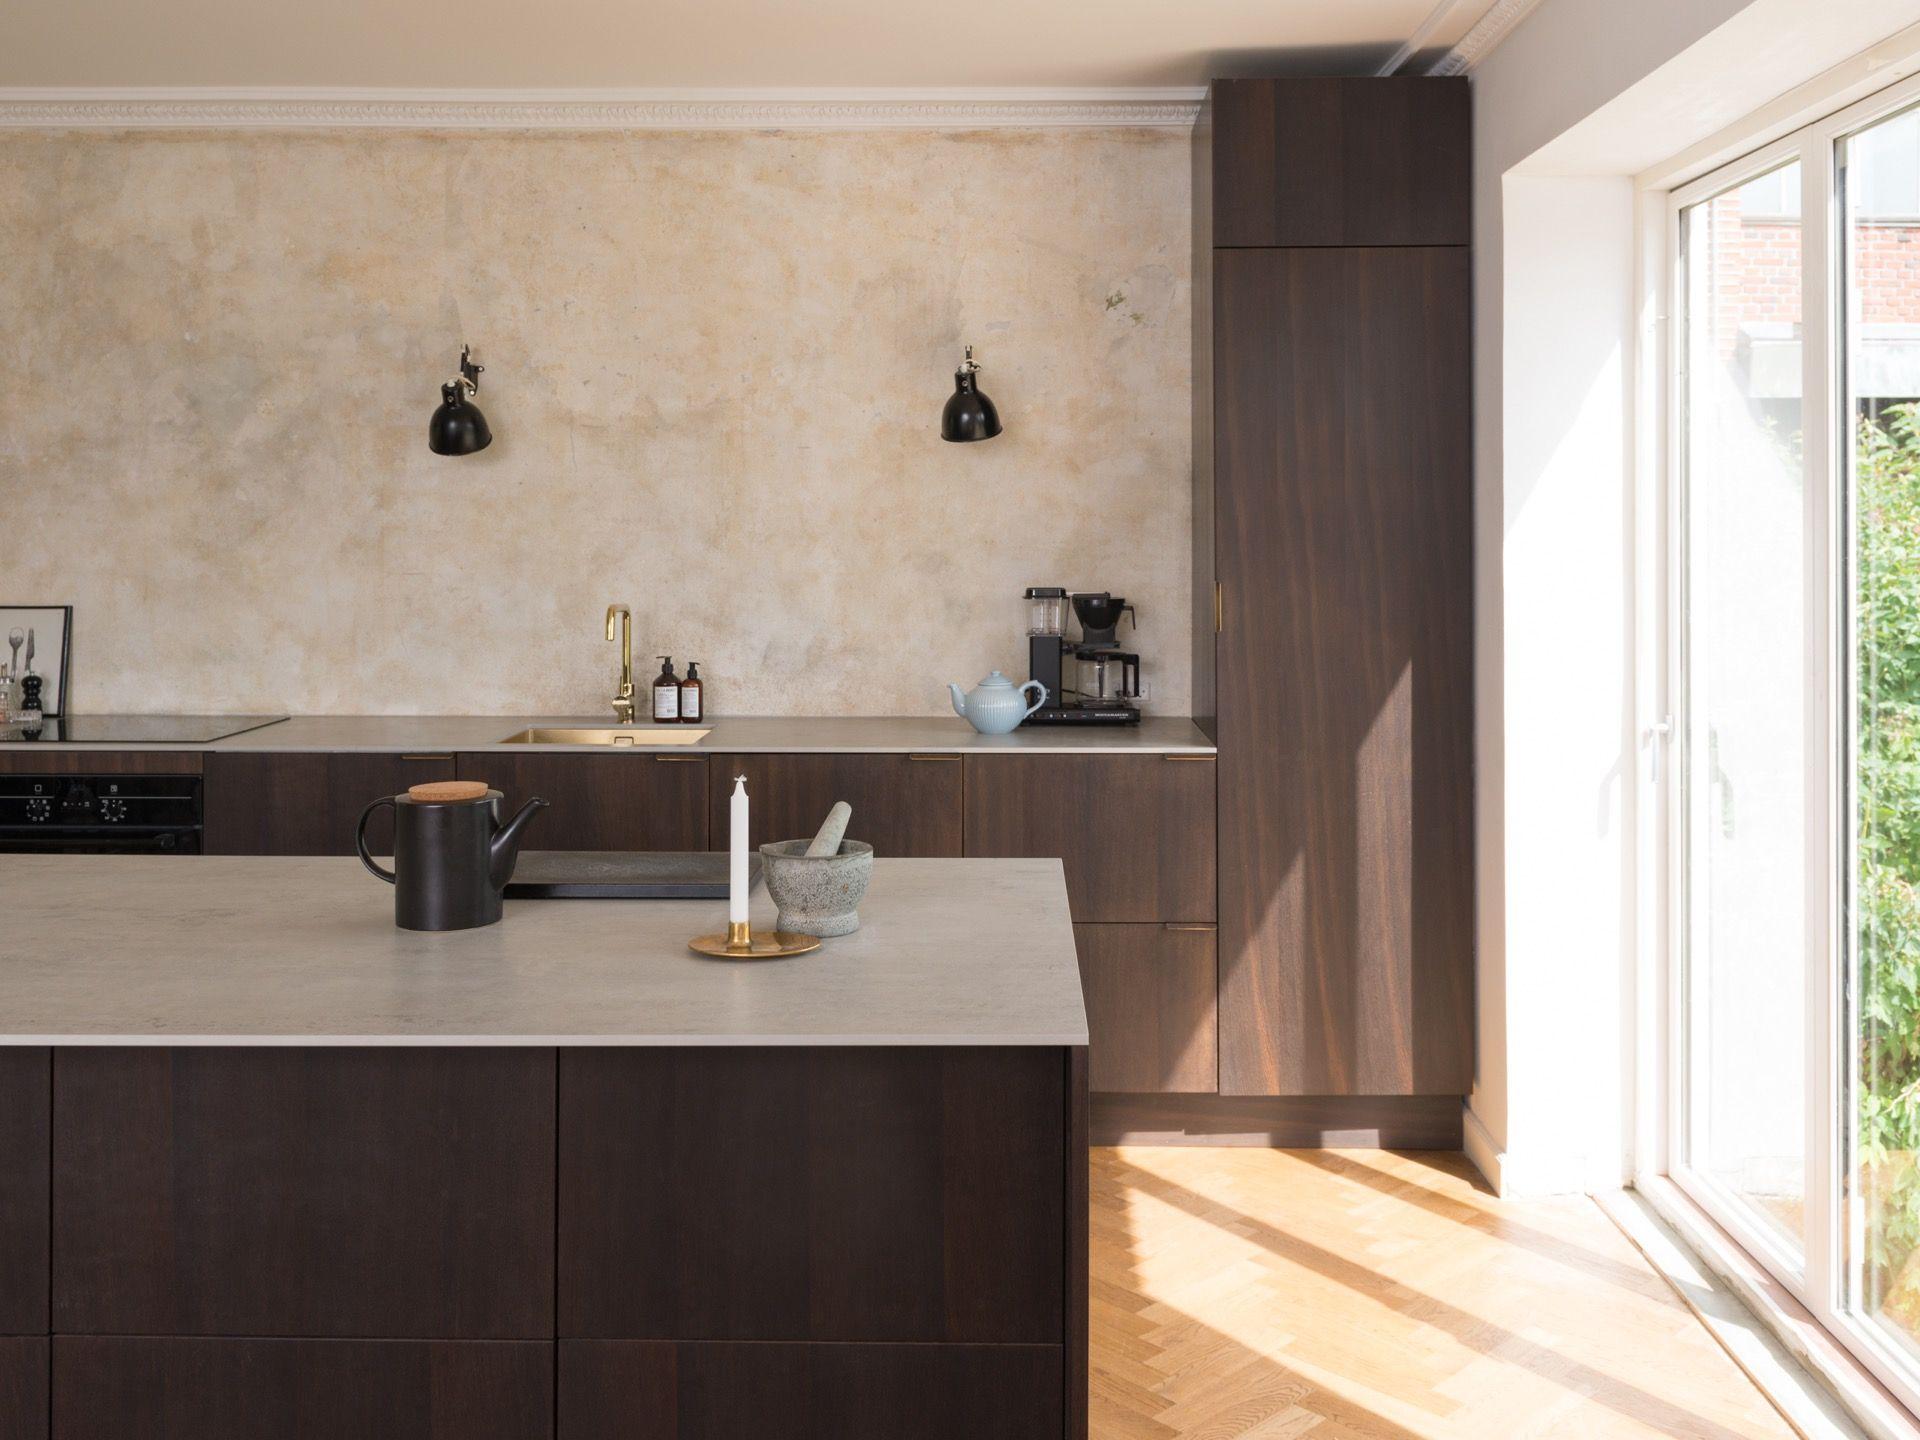 45546918c74200faaf85b34044866834 Frais De Bar Ikea Cuisine Concept